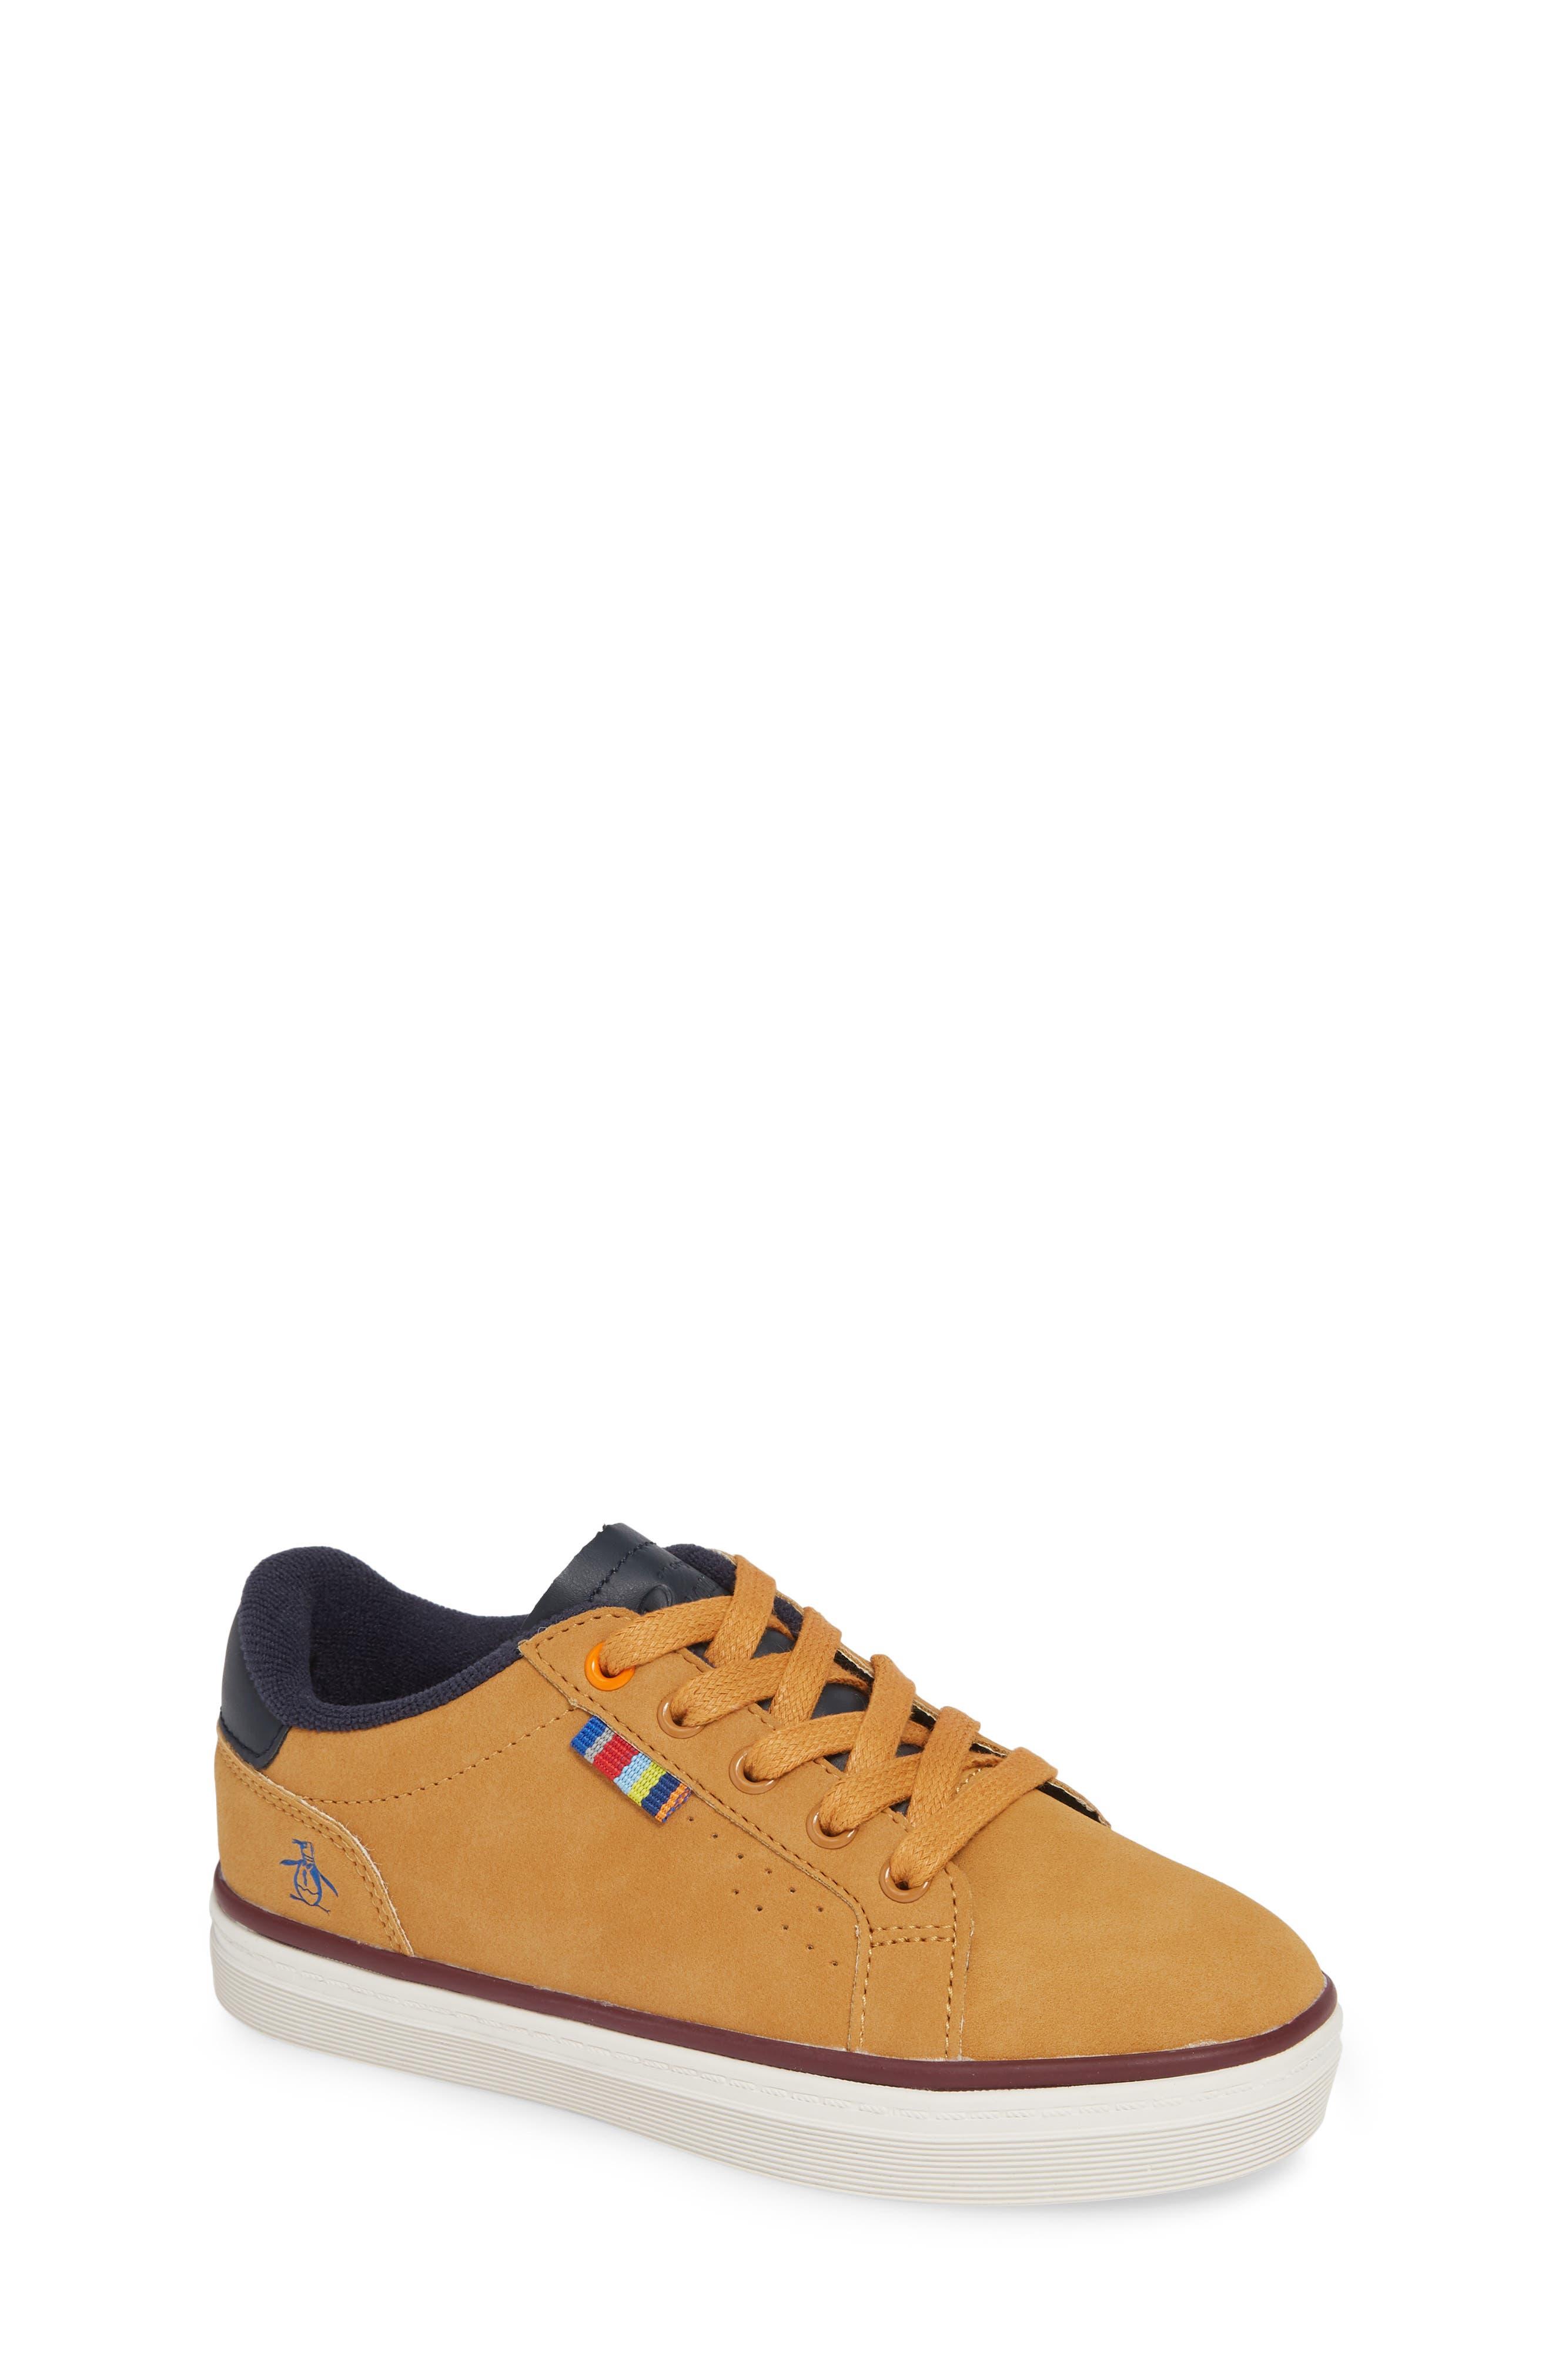 ORIGINAL PENGUIN,                             Dexter Sneaker,                             Main thumbnail 1, color,                             WHEAT/ NAVY